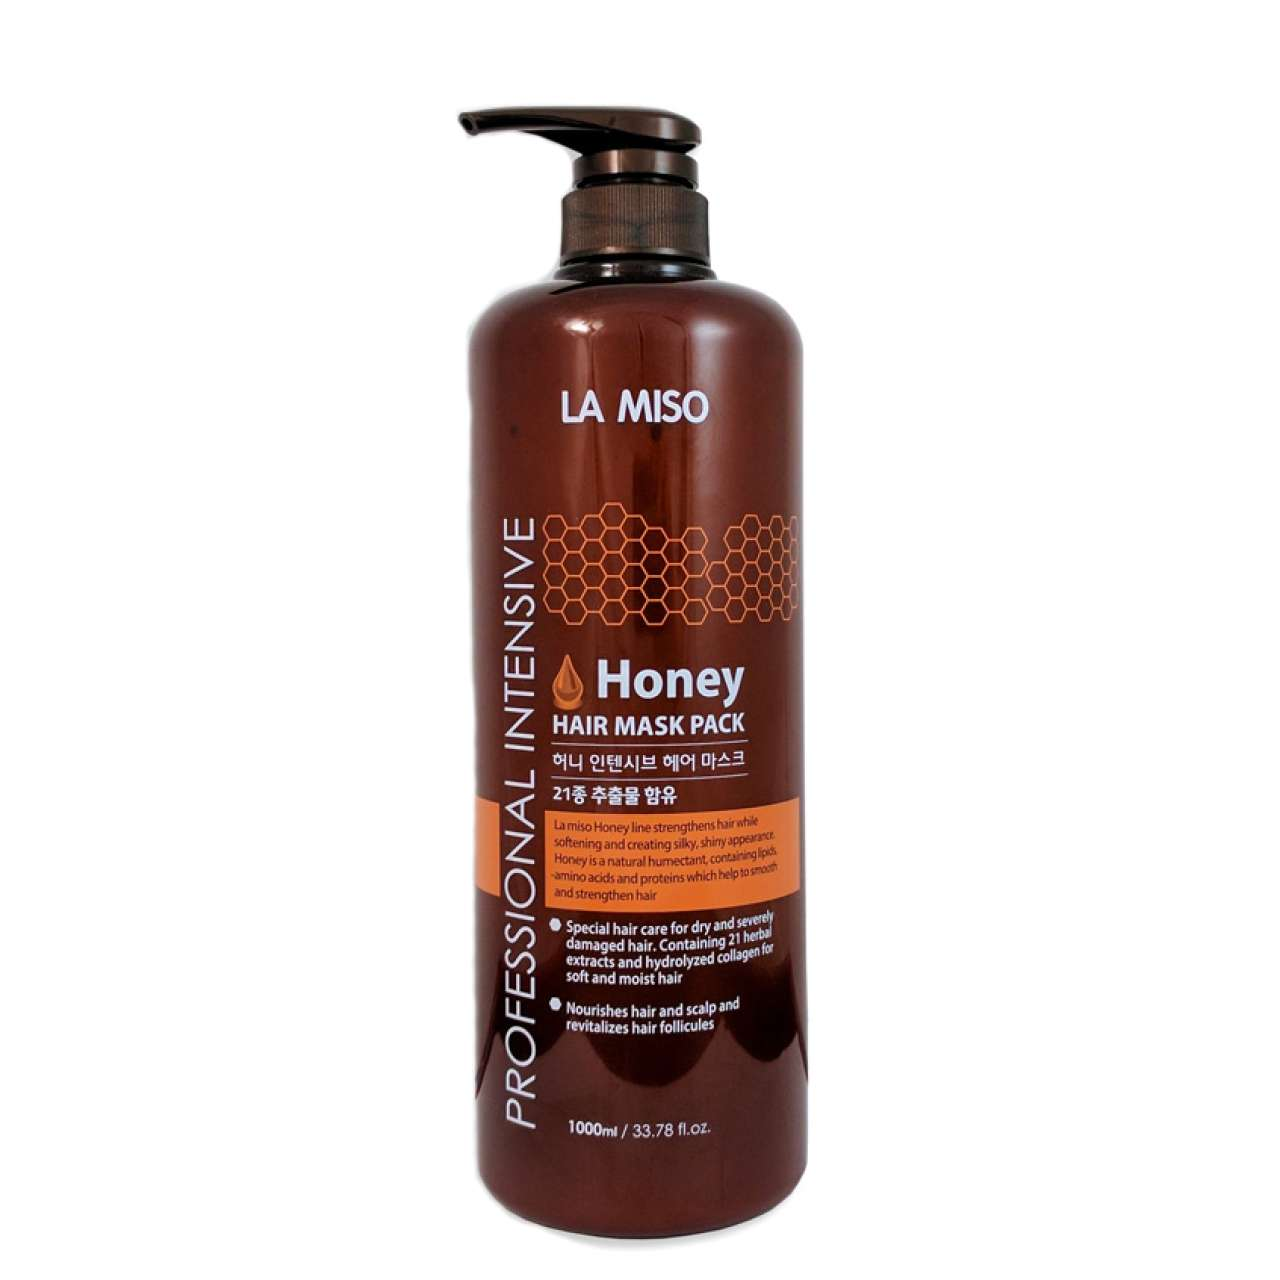 LA MISO Professional Intensive Honey Маска для волос